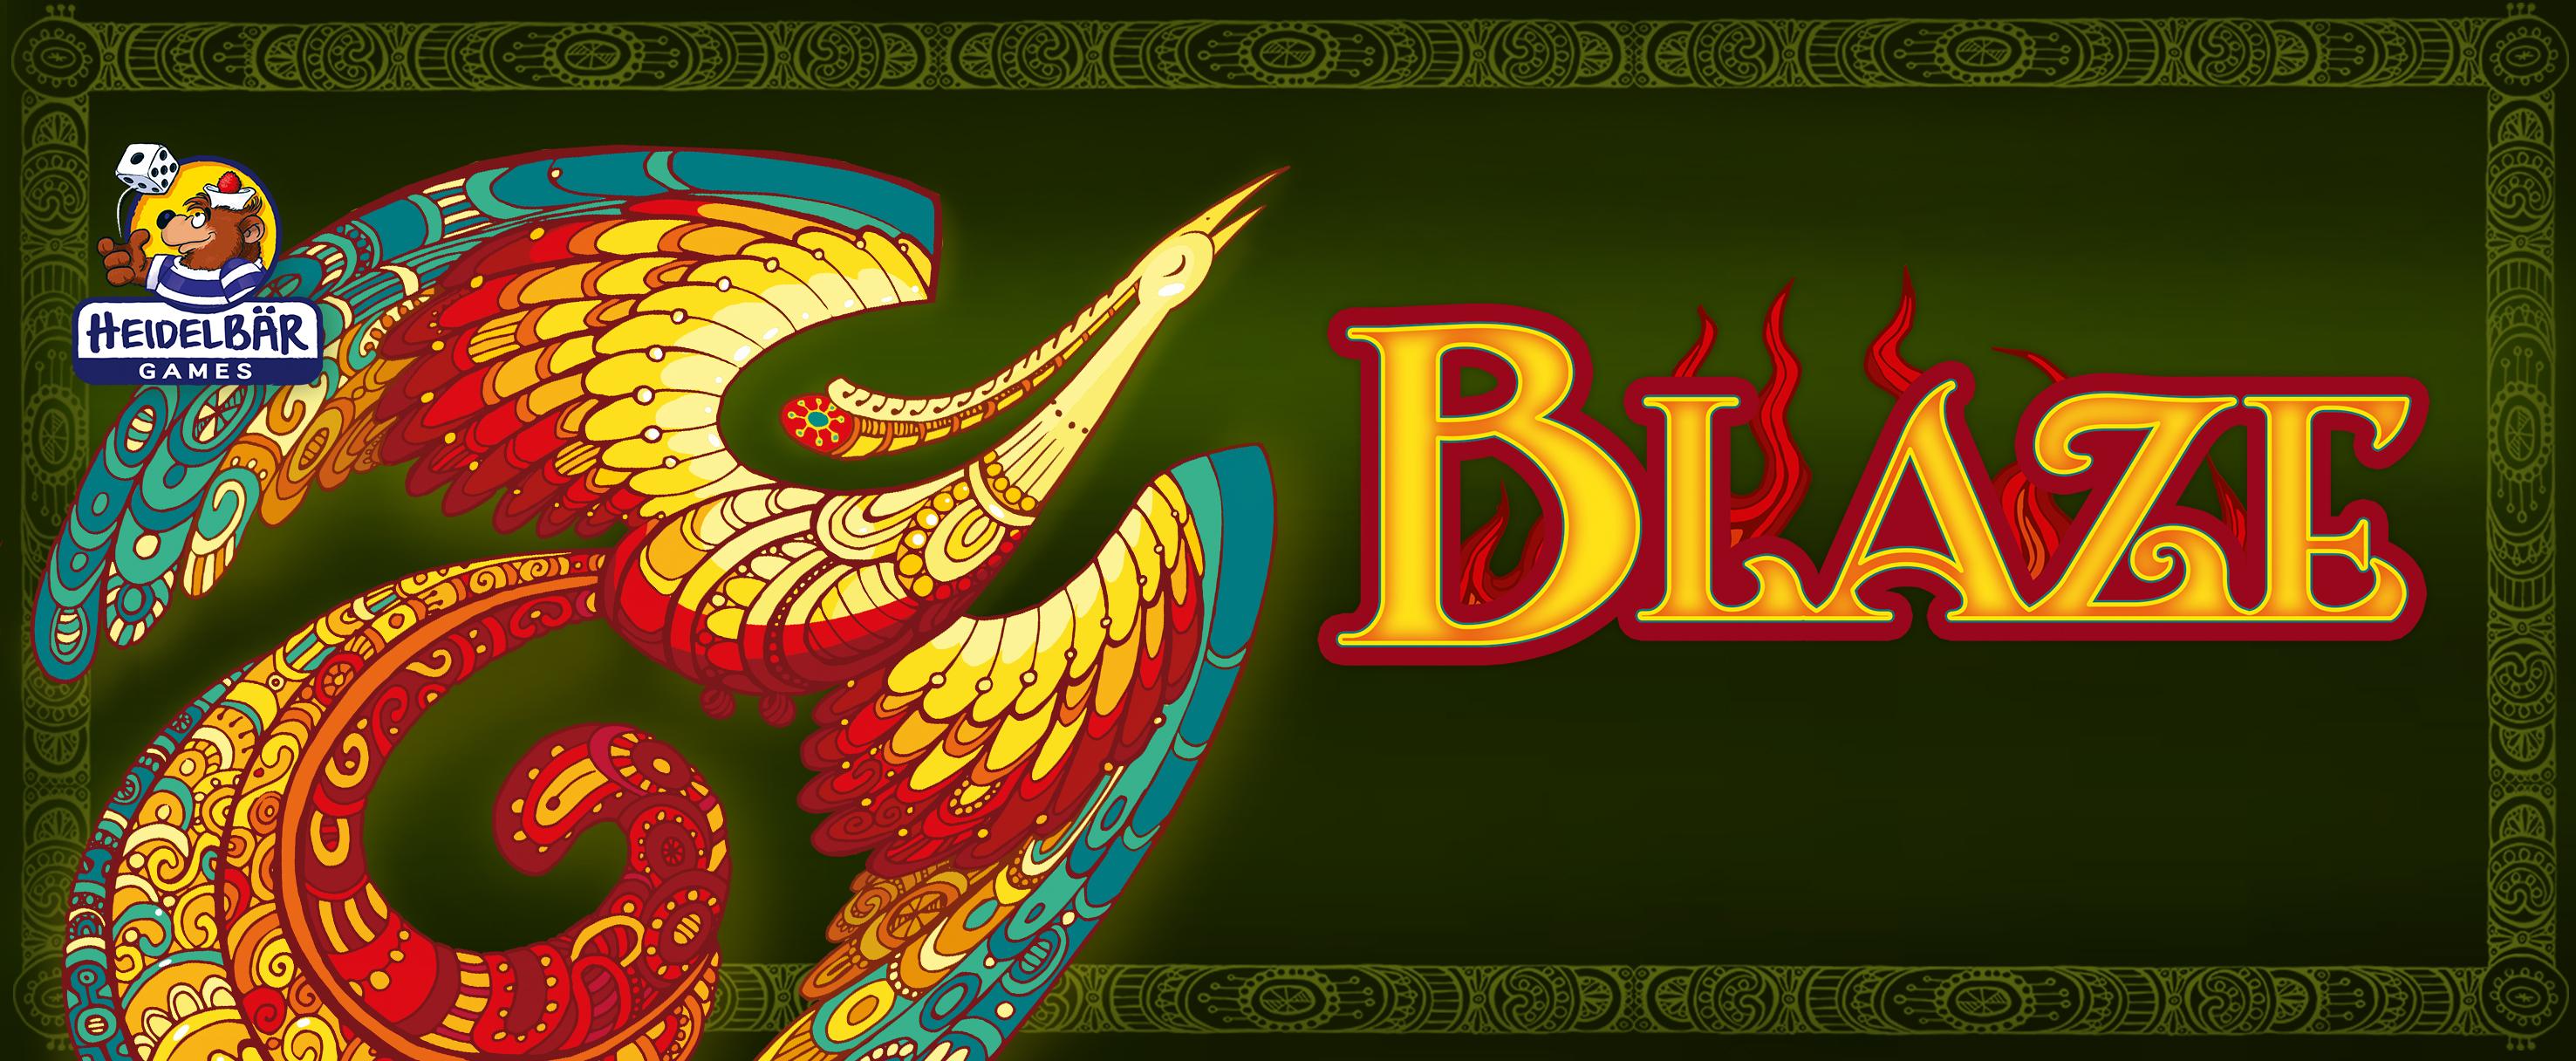 Banner Blaze